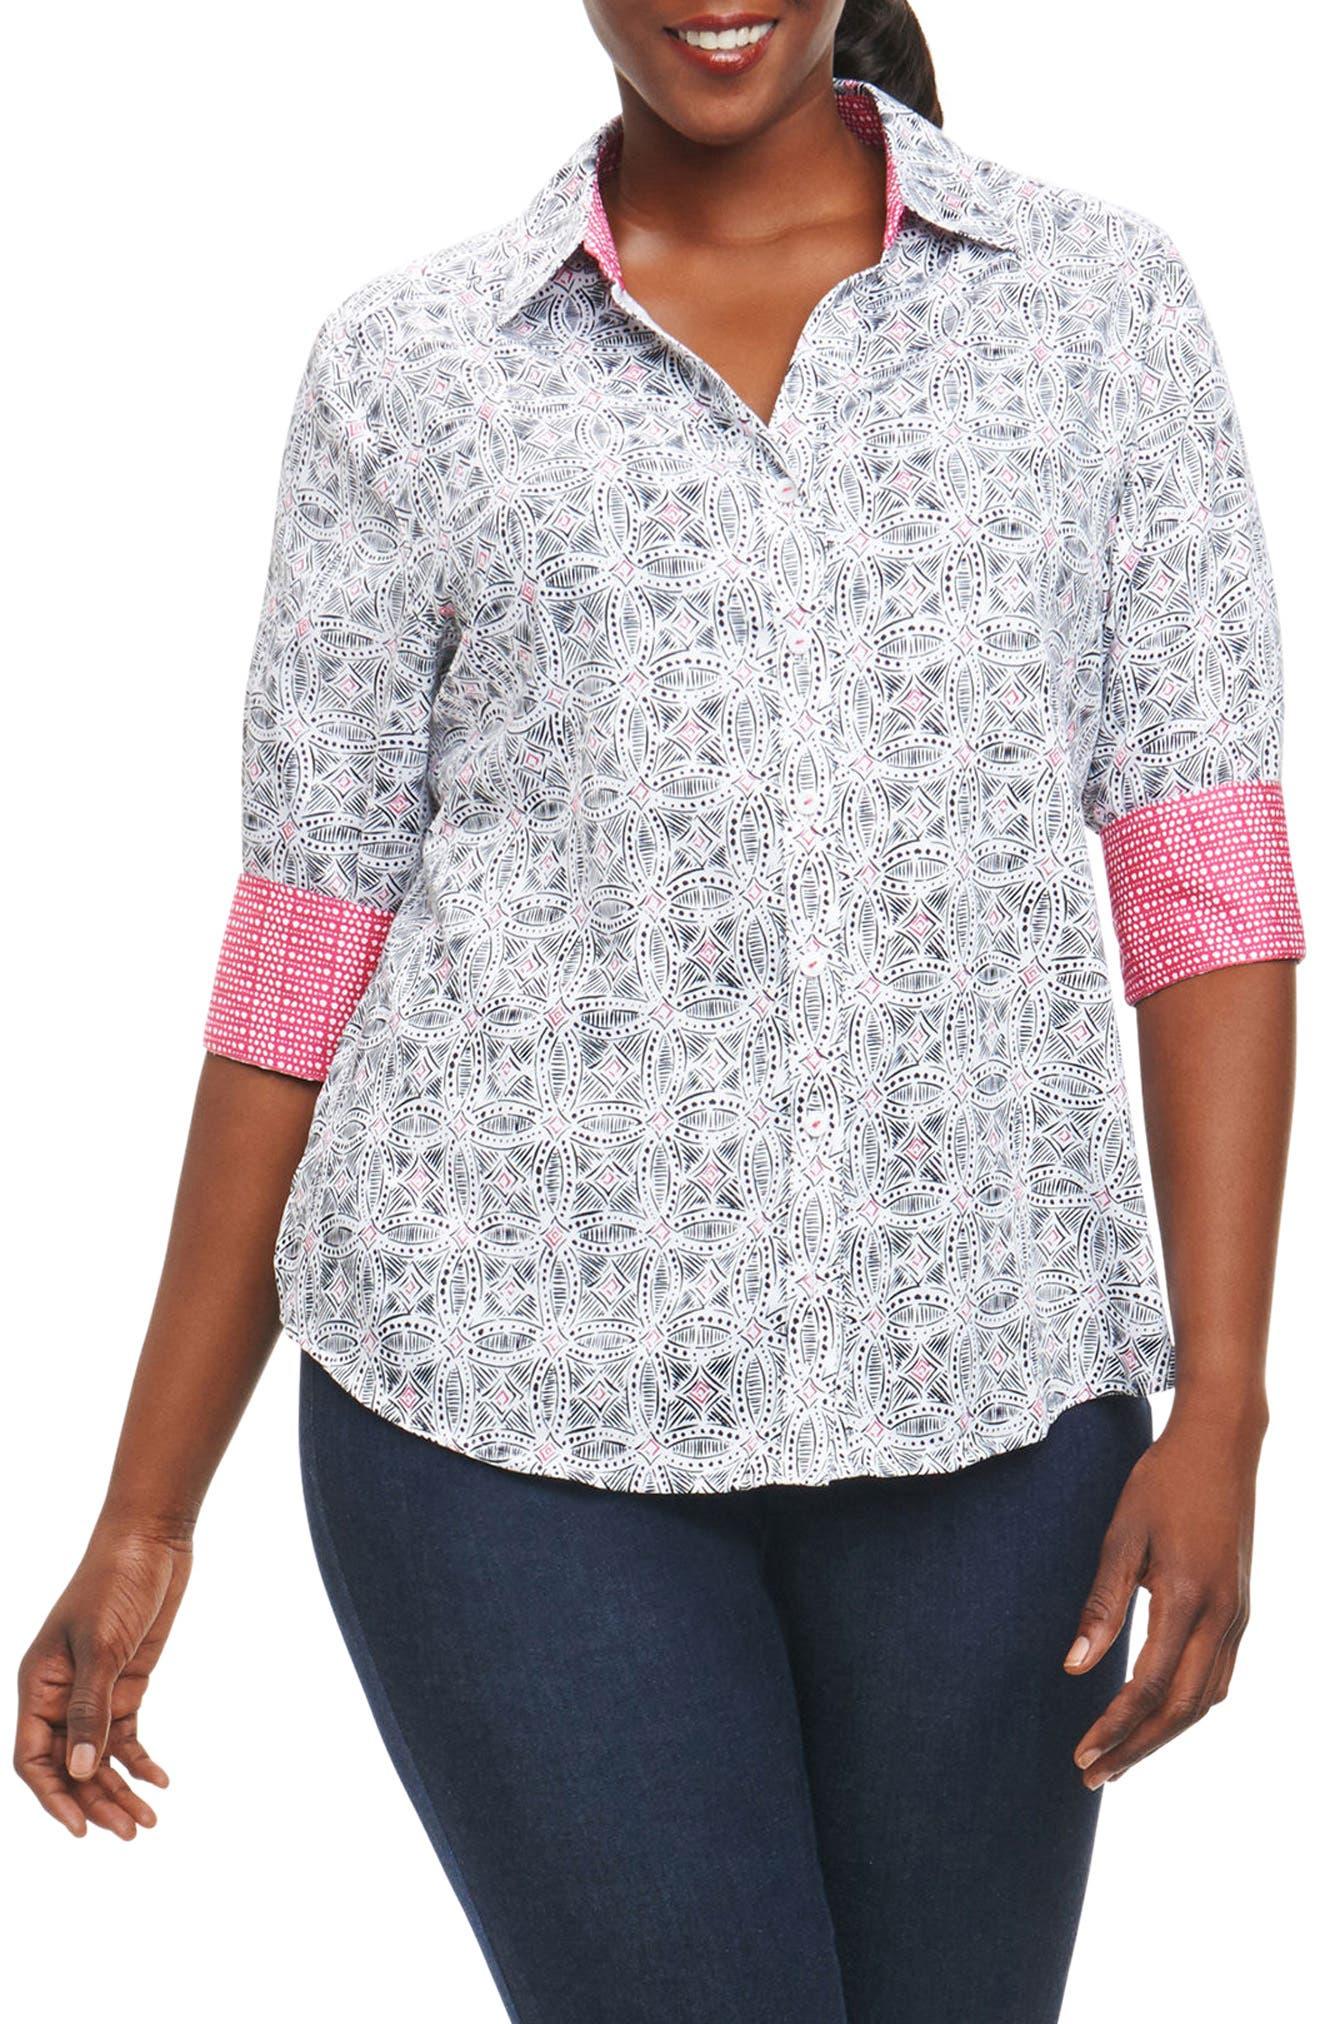 Main Image - Foxcroft Mary Circle Tile Print Shirt (Plus Size)